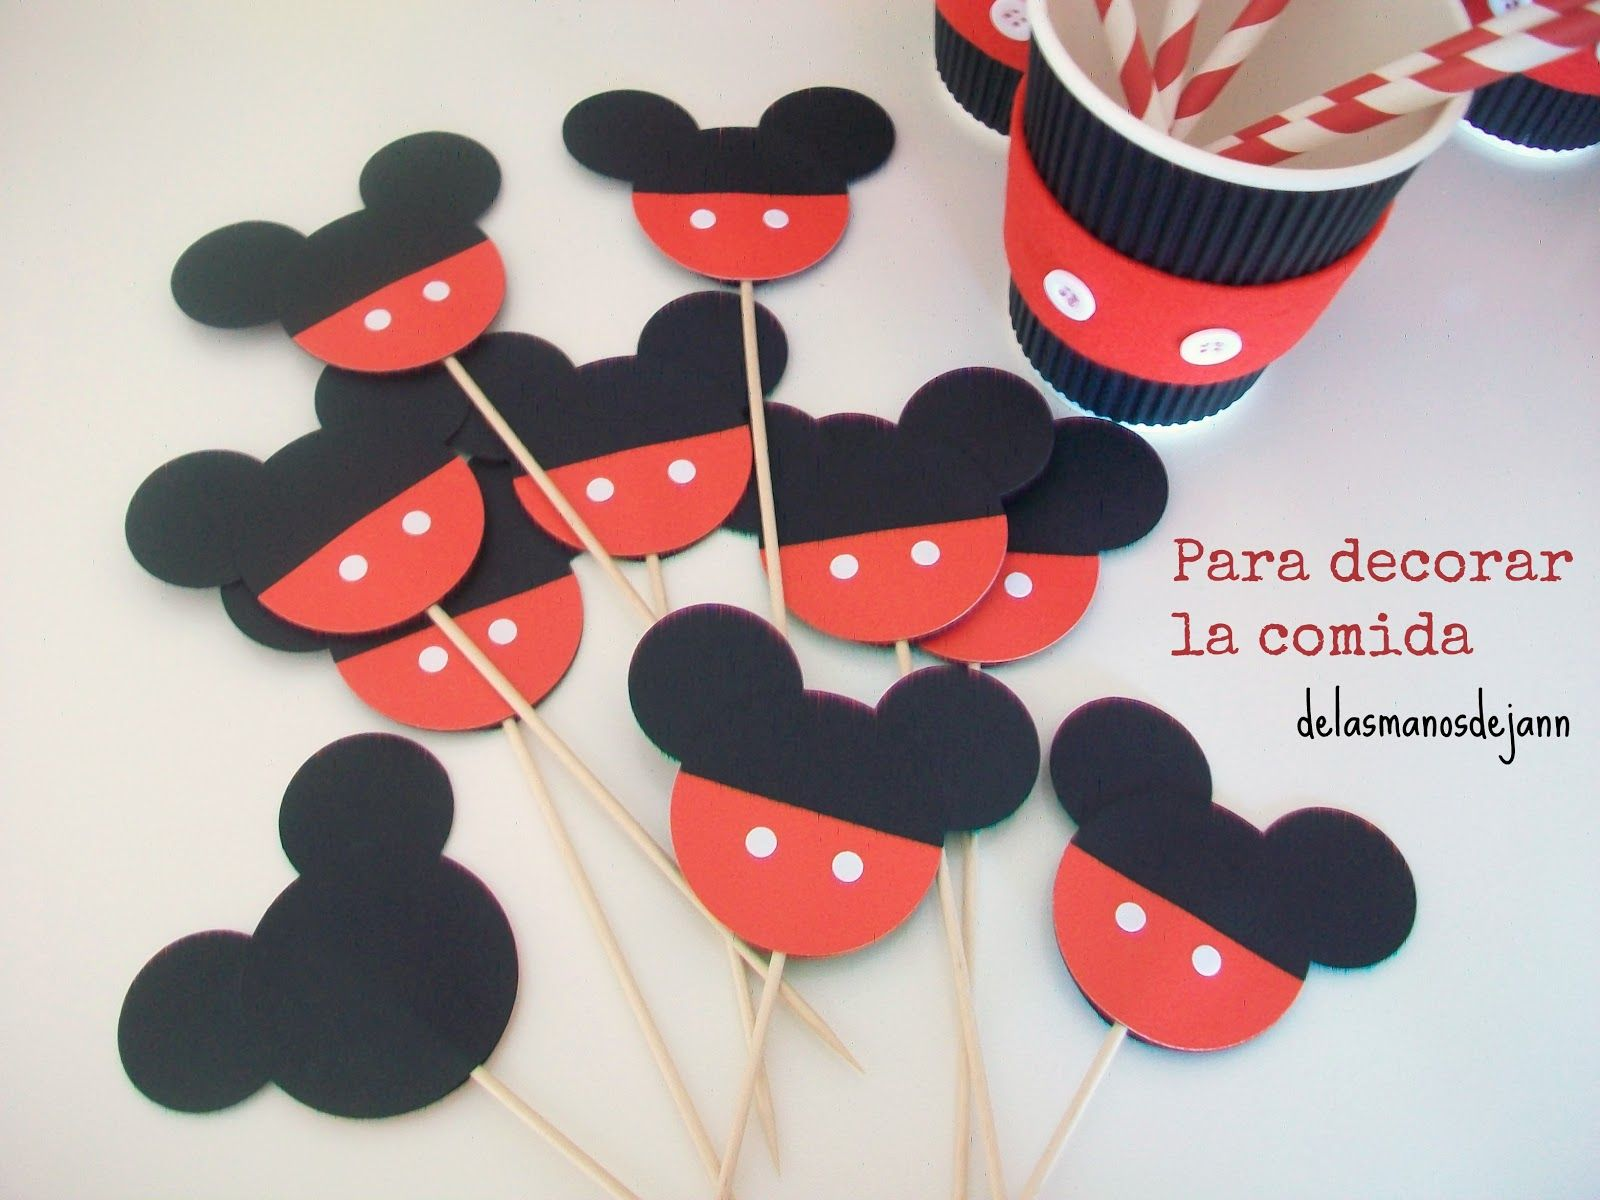 topes decorativos para cupcakes De las manos de Jann ...